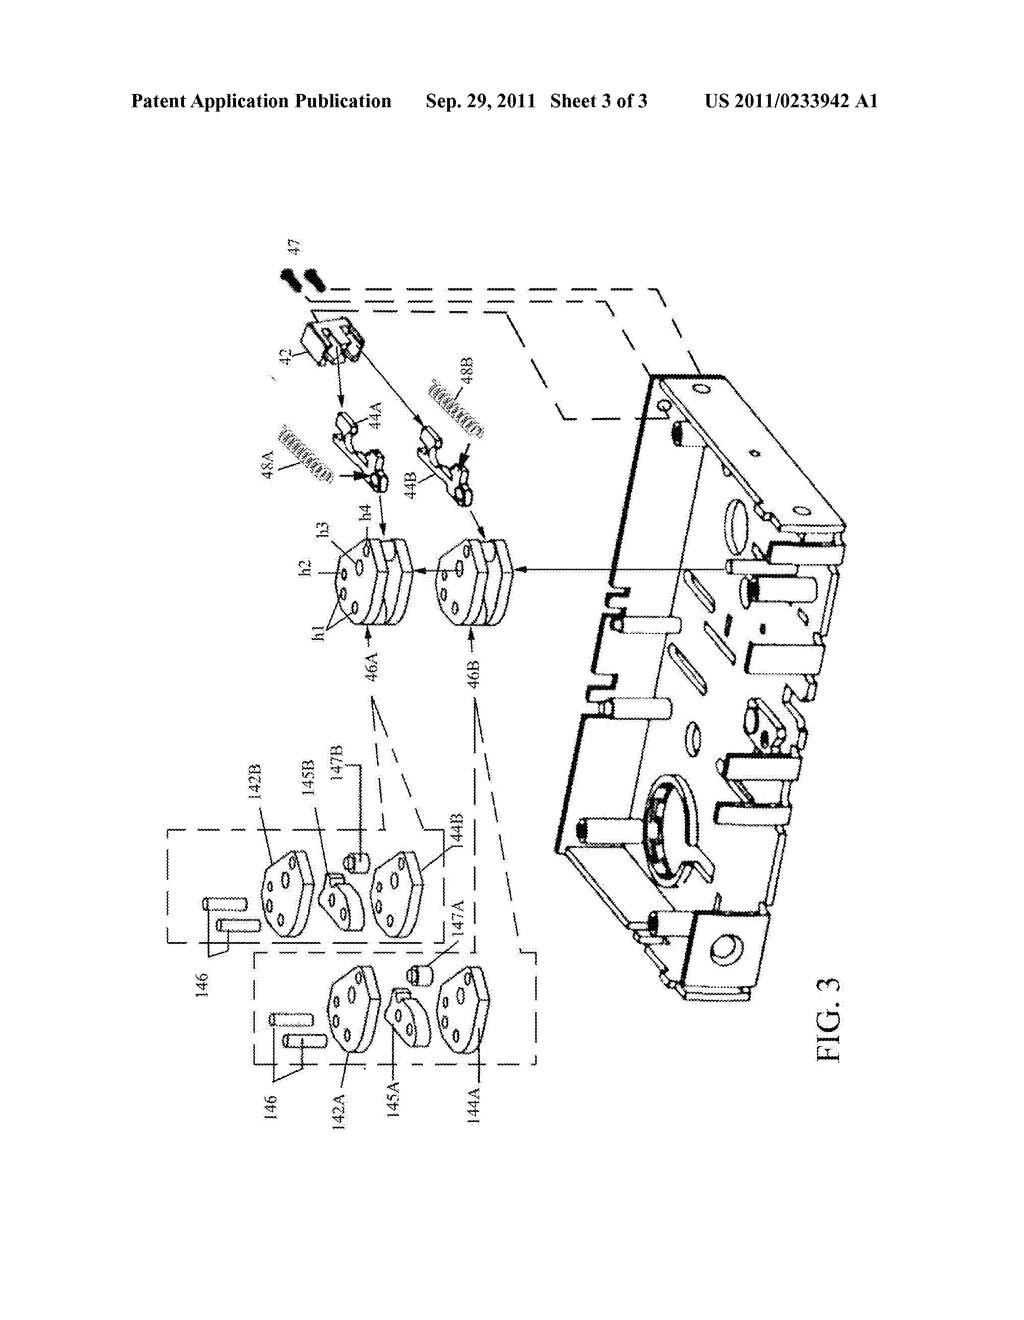 mortise lock with dual reverse lockout mechanism diagram rh patentsencyclopedia com inside mortise lock diagram inside mortise lock diagram